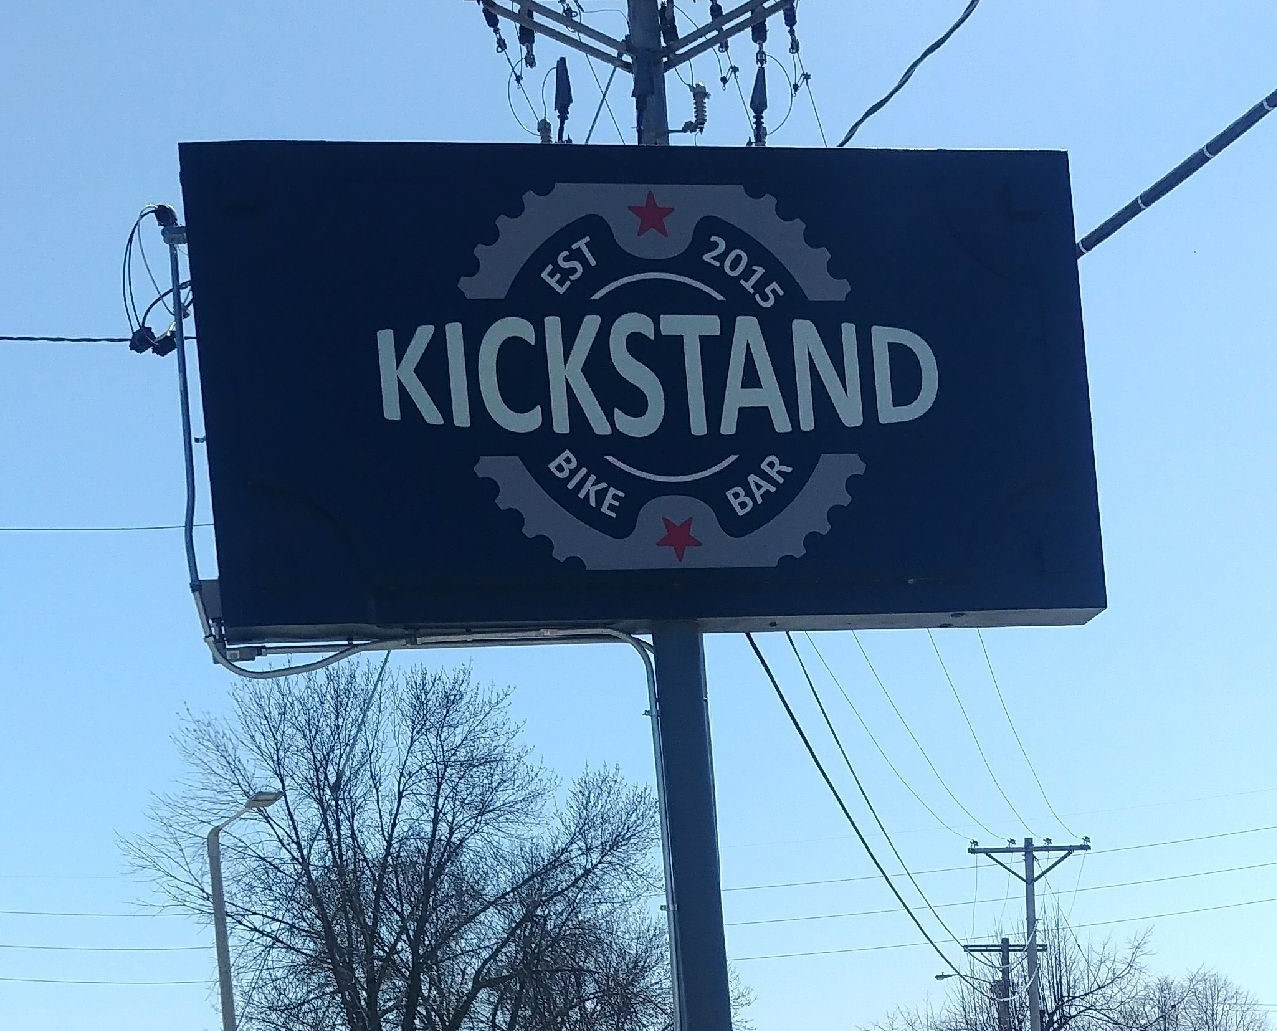 kickstand-e1527820483348.jpg